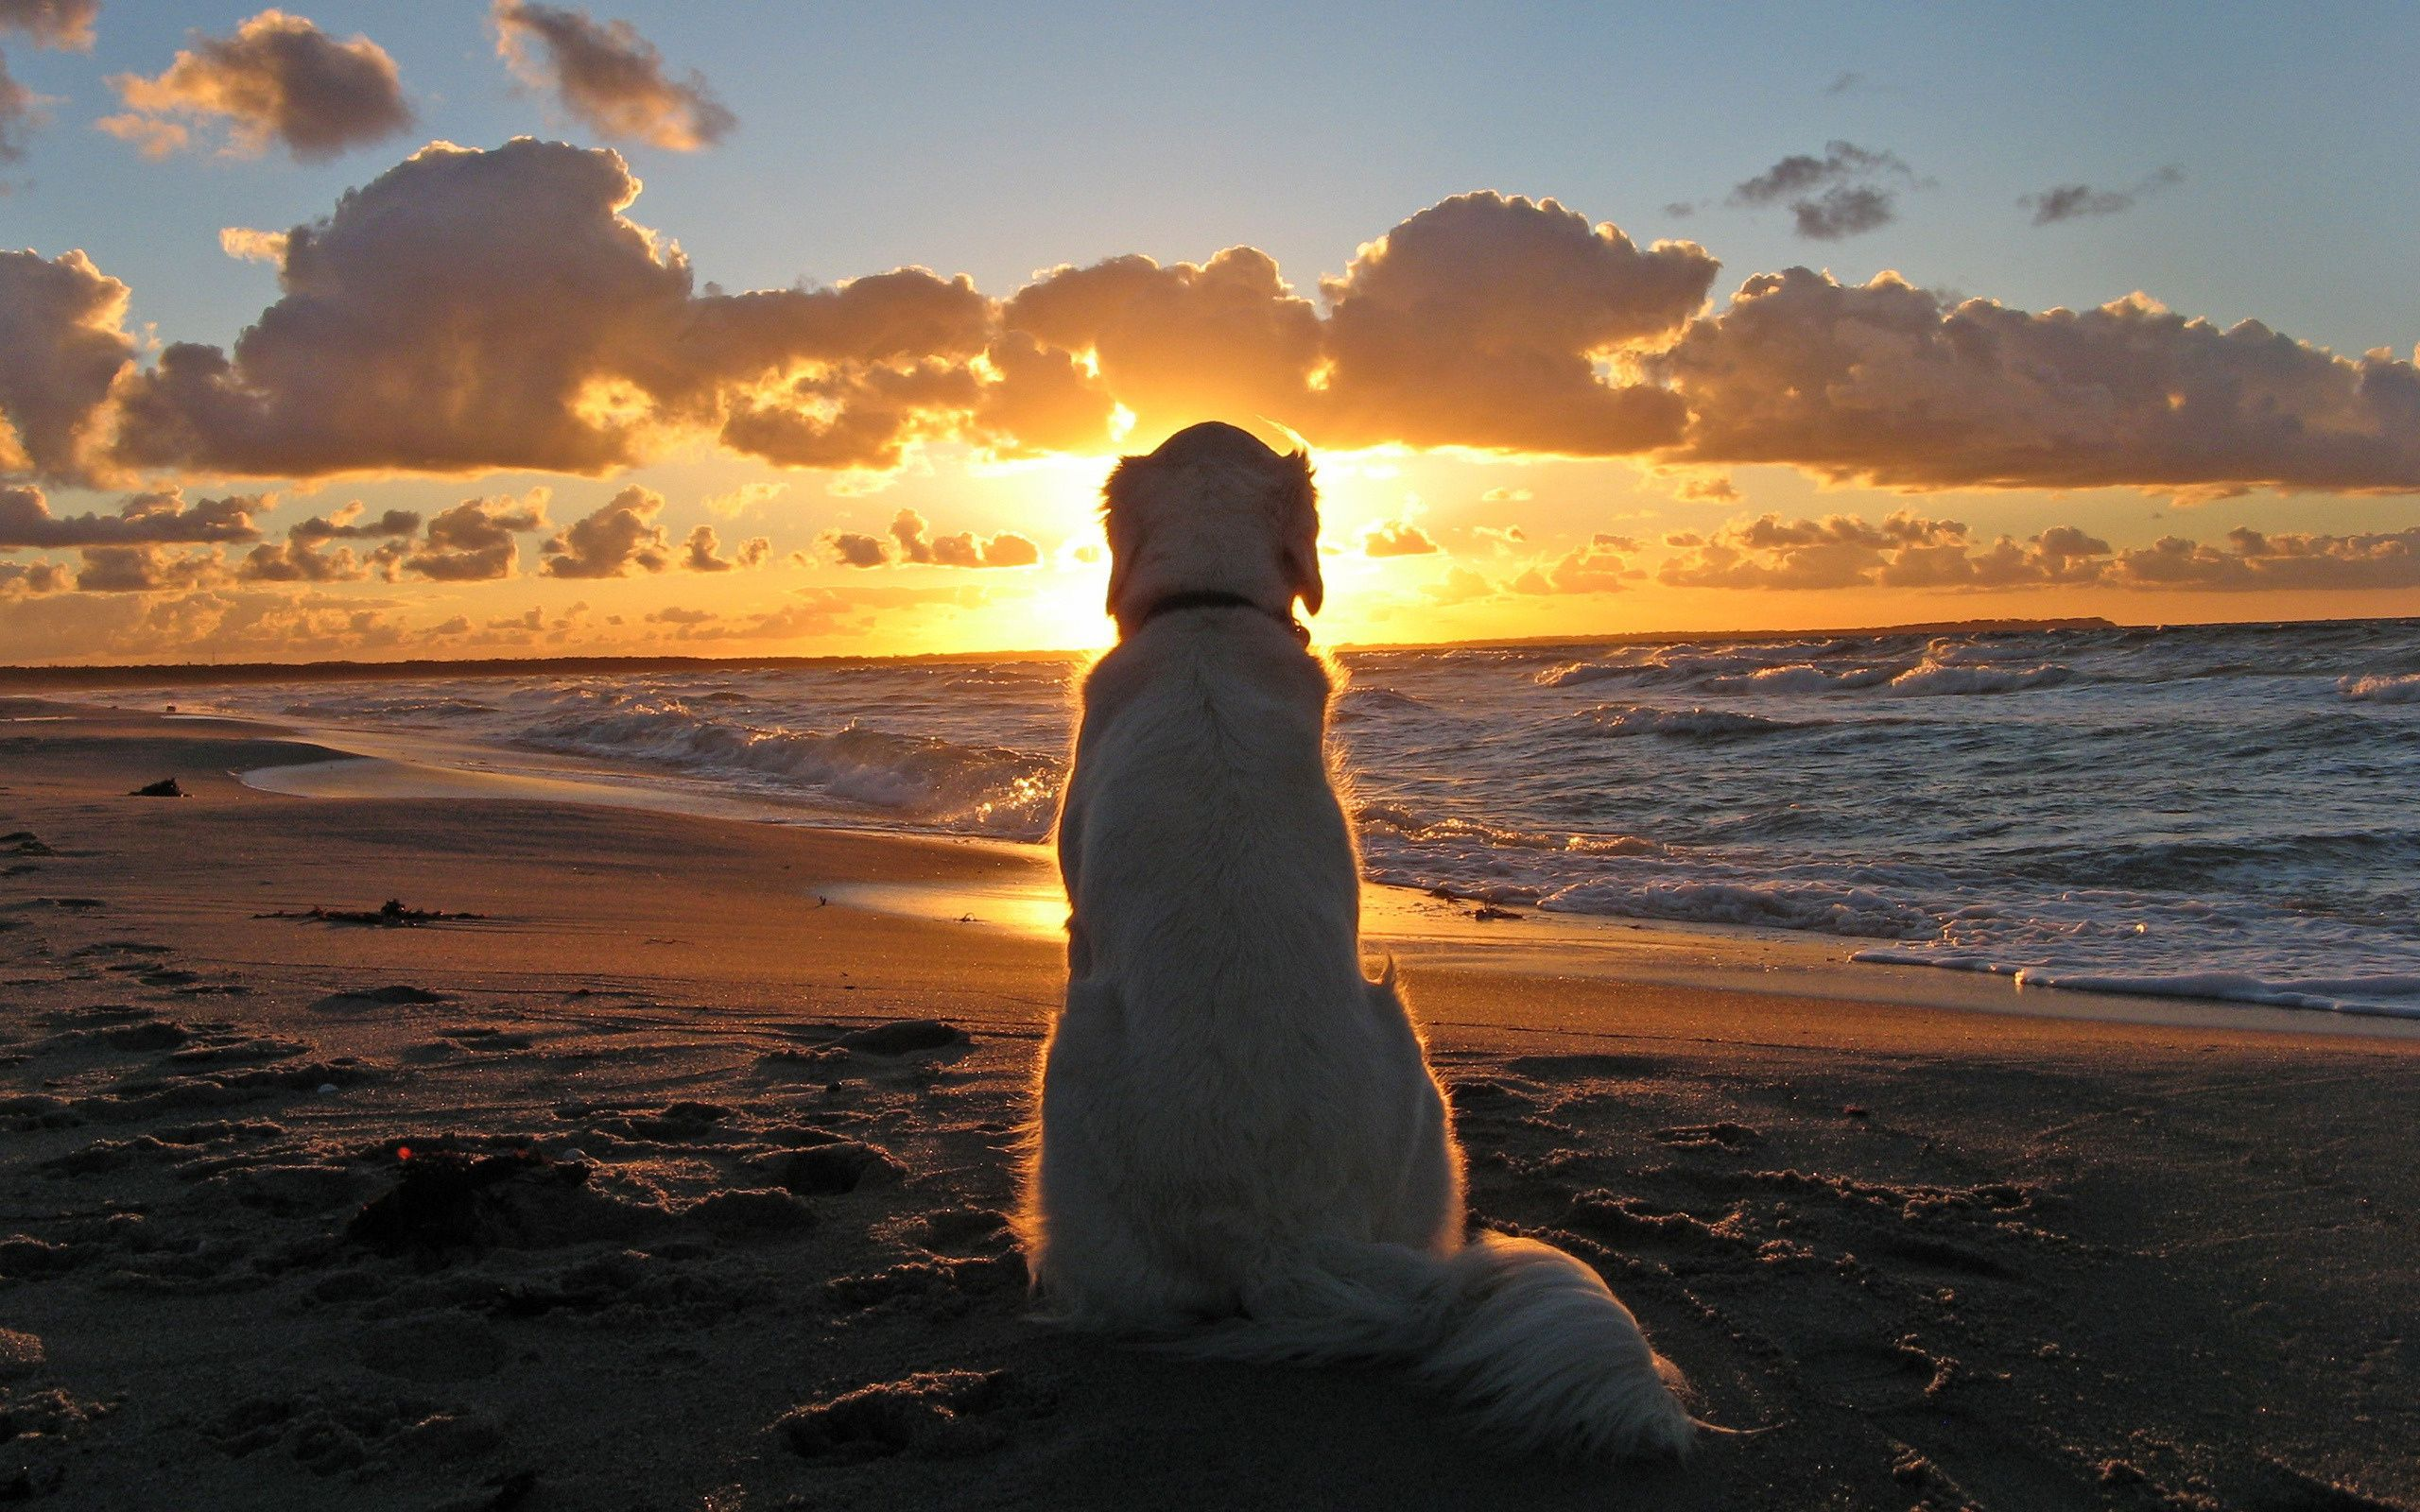 sea beach sunset dog silhouette wallpaper x | hd wallpapers